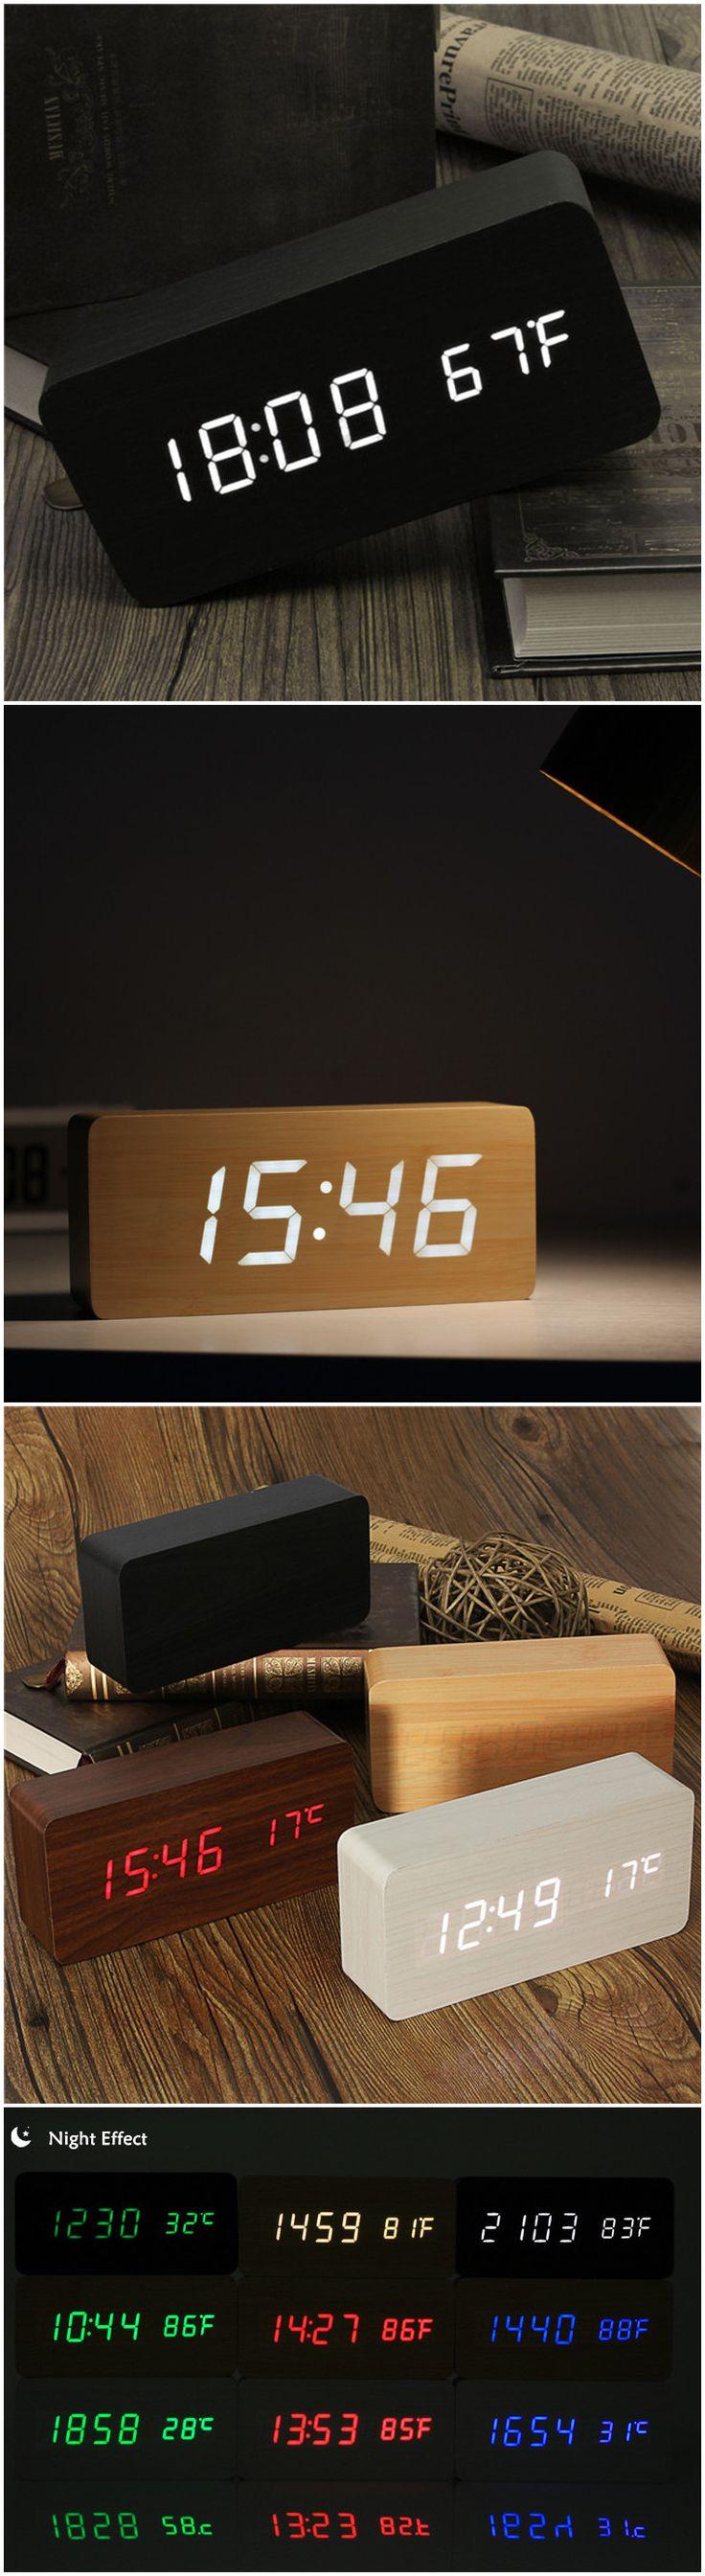 Voice Control Wooden Box LED Alarm Clock Digital Desk Clock Thermometer  Calendar at Banggood. Best 25  Digital alarm clock ideas on Pinterest   Marble bedroom